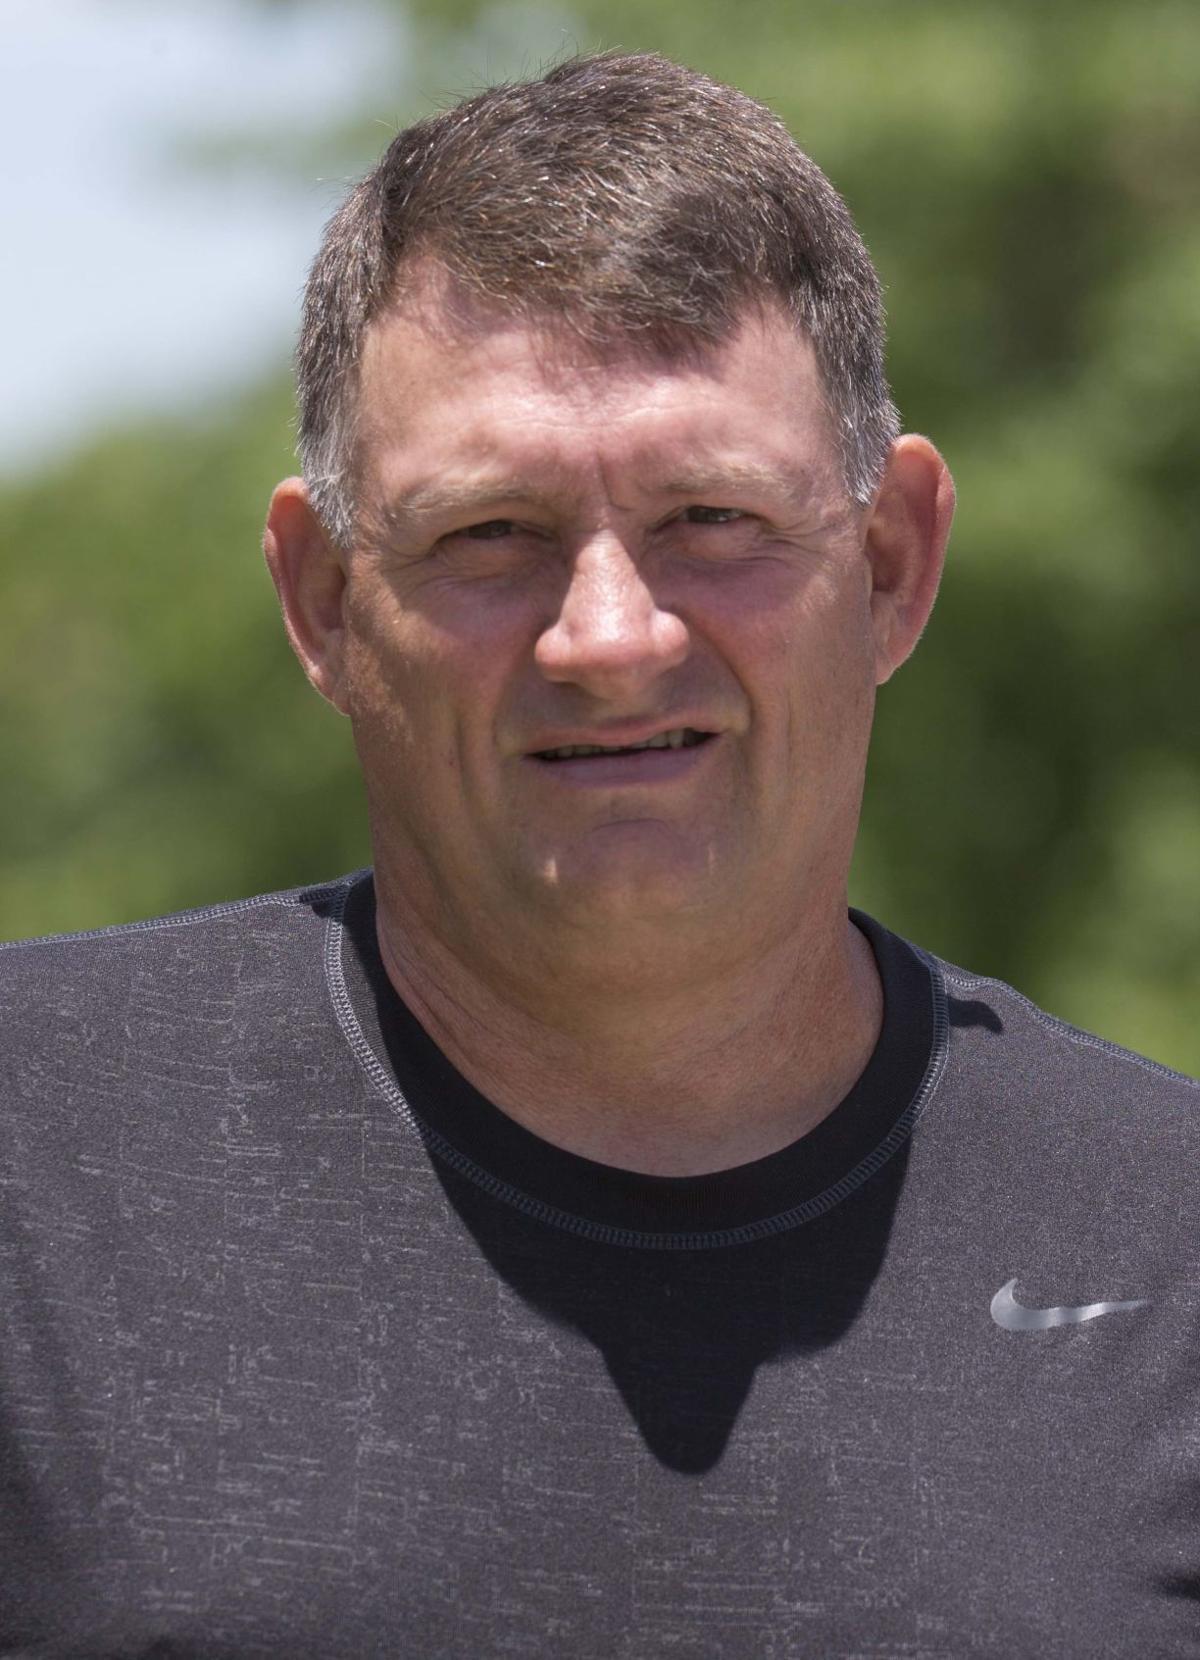 Wayne County Wildcats: Wayne County uses playoff loss as 2018